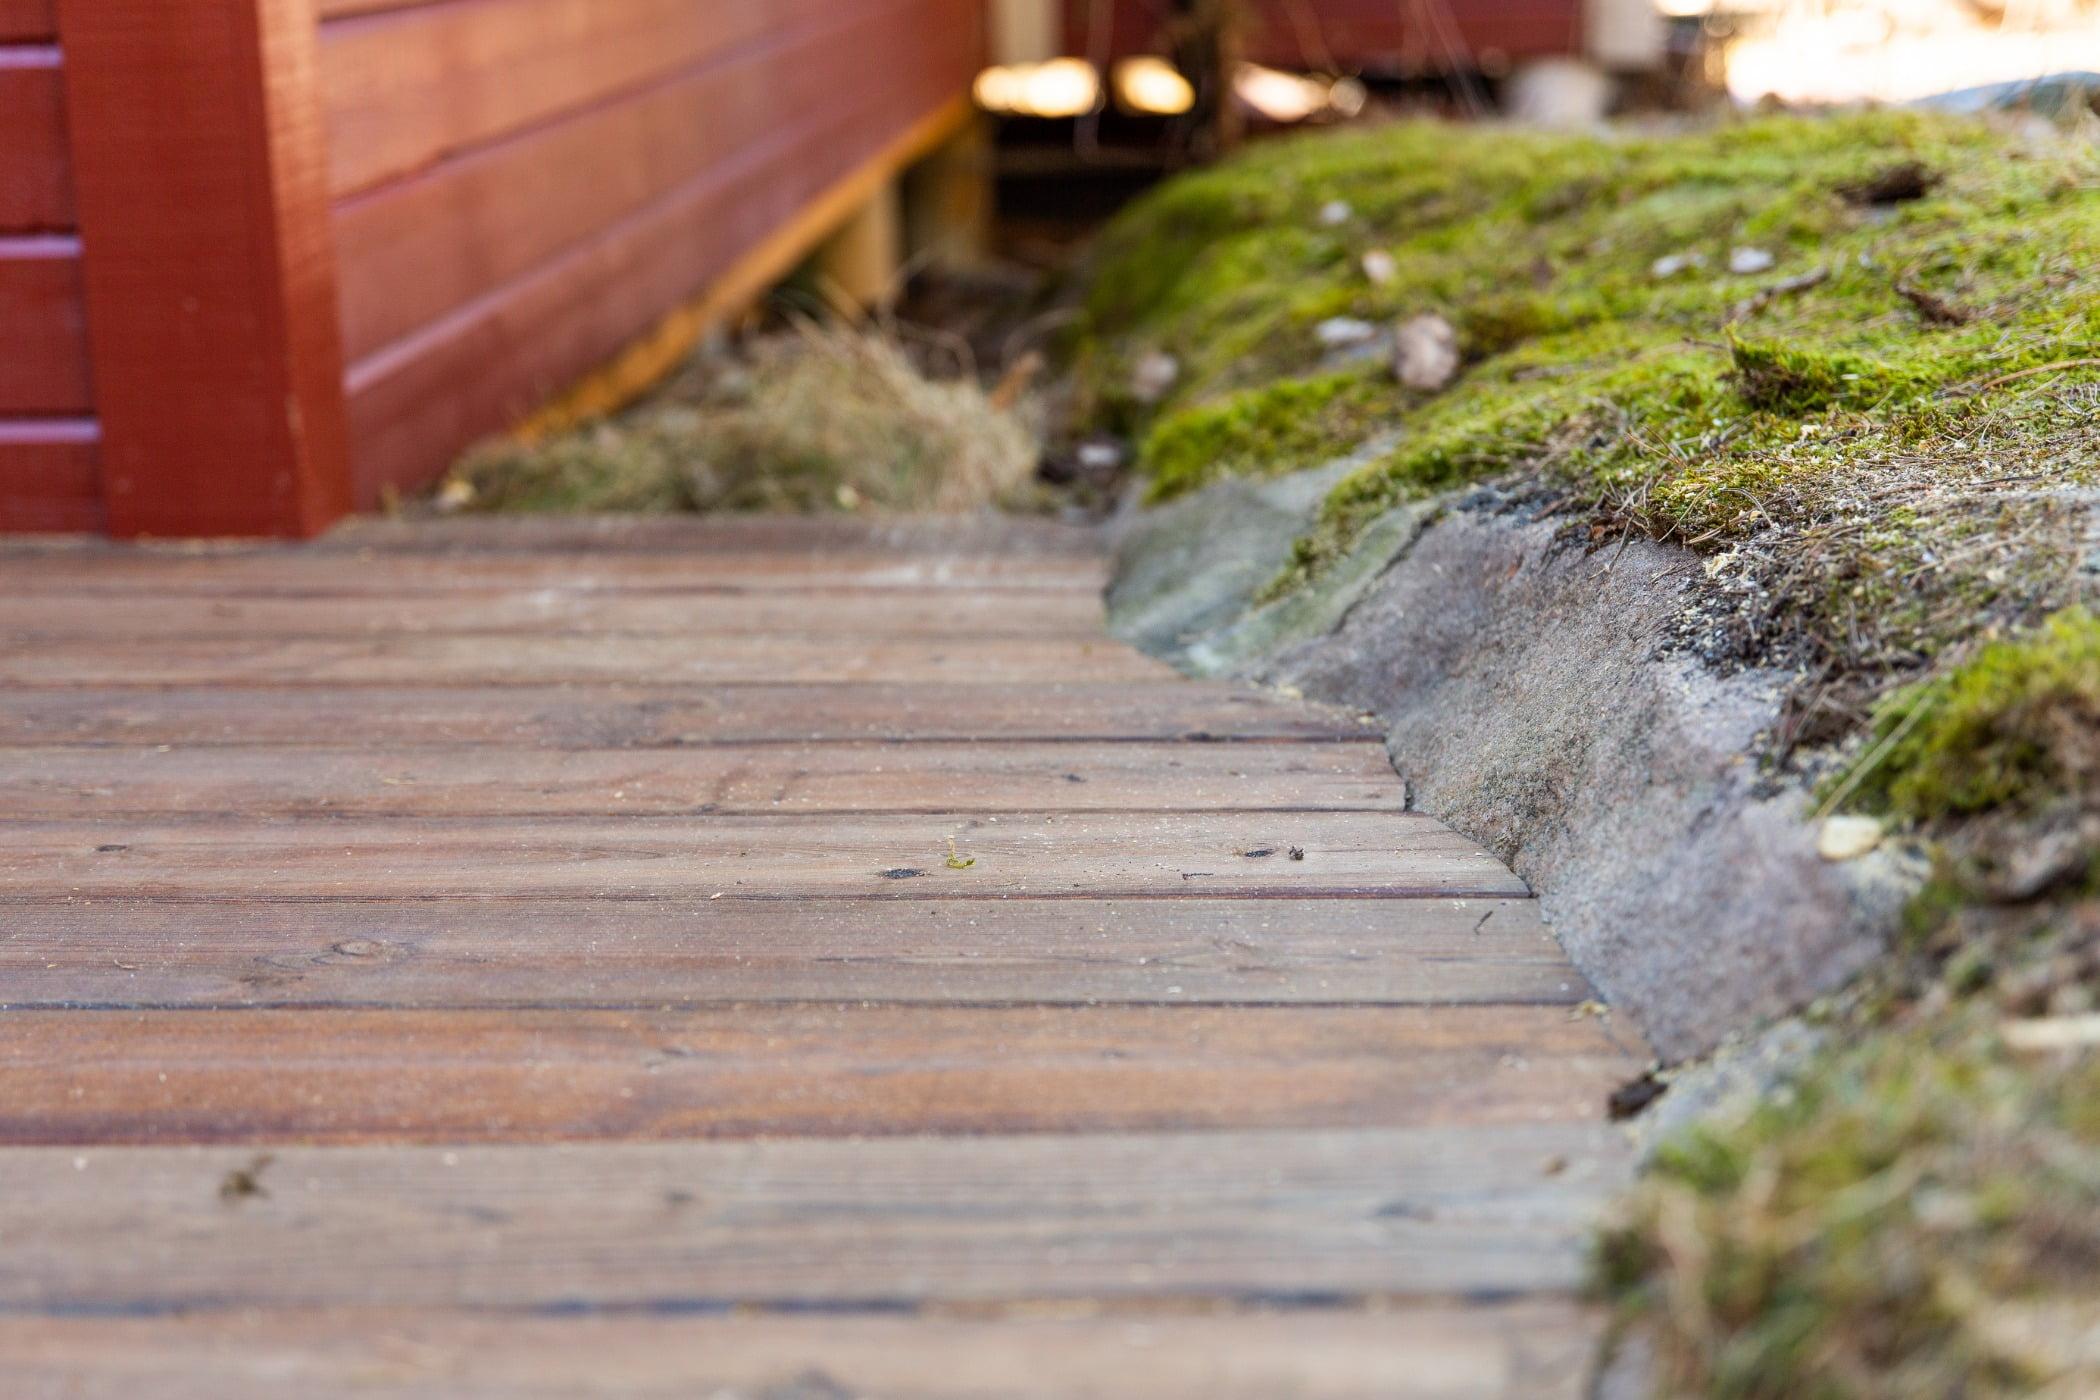 Road surface, Wood, Flooring, Grass